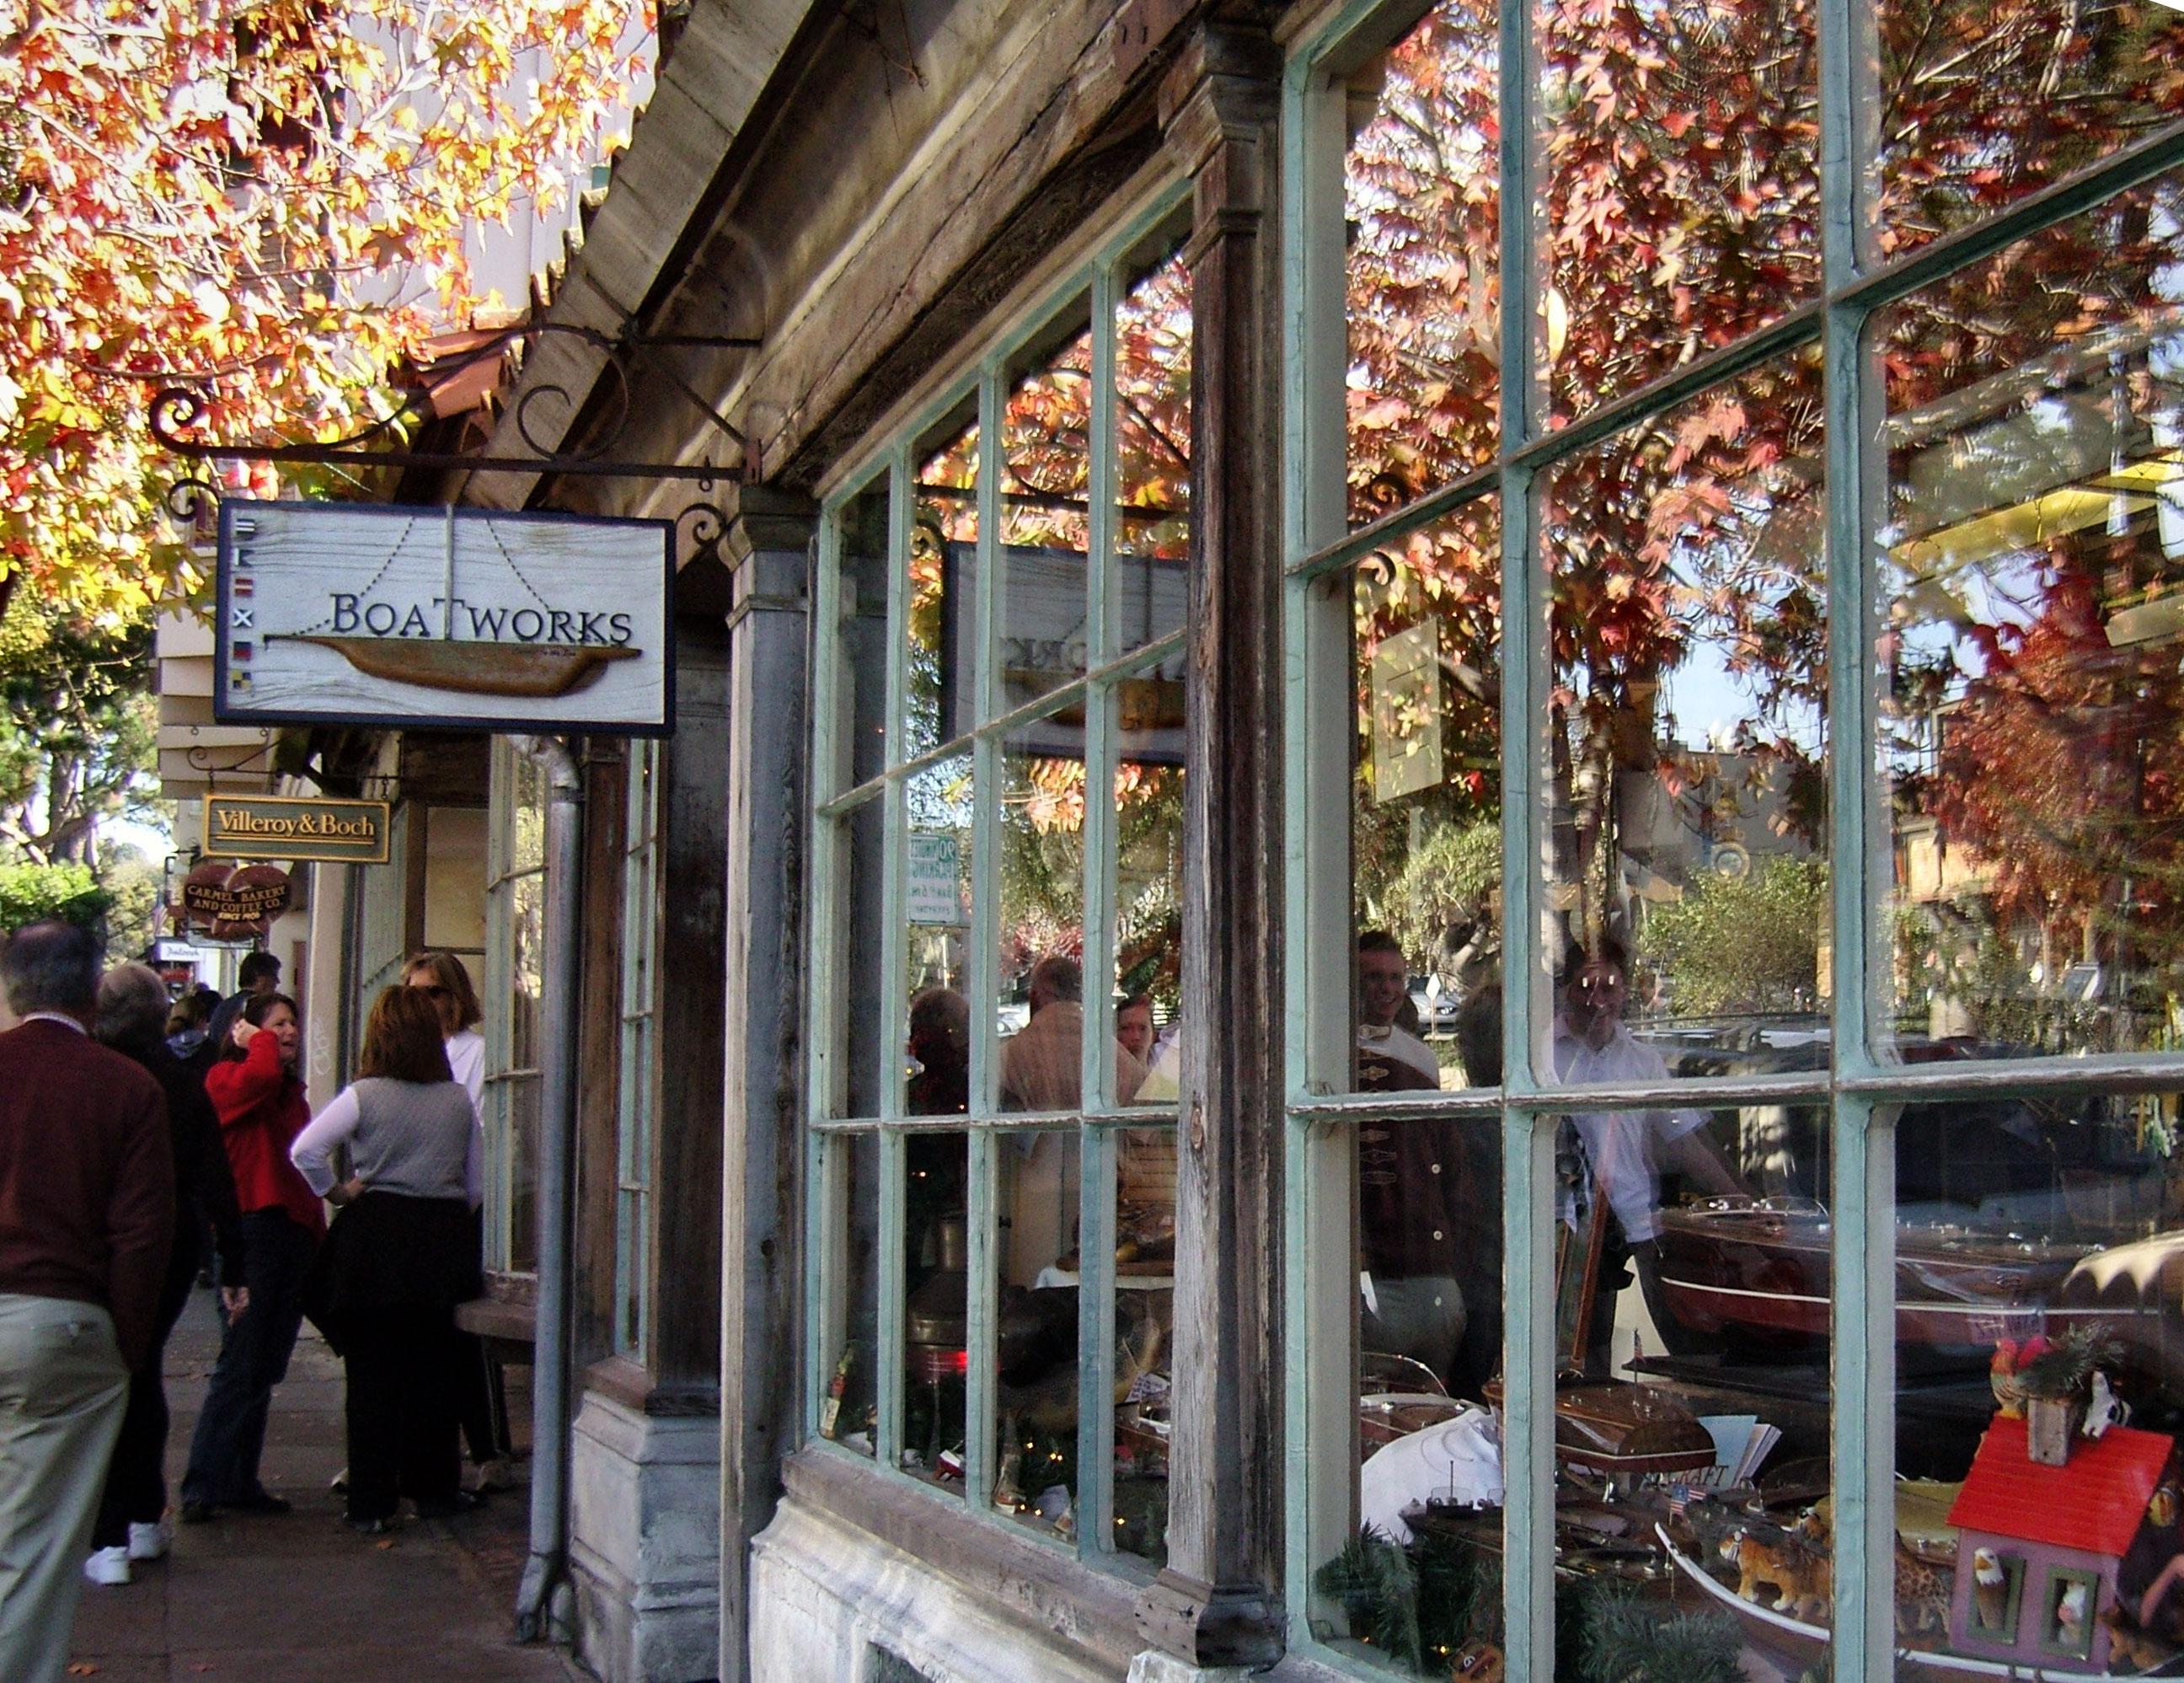 Carmel romantic small towns